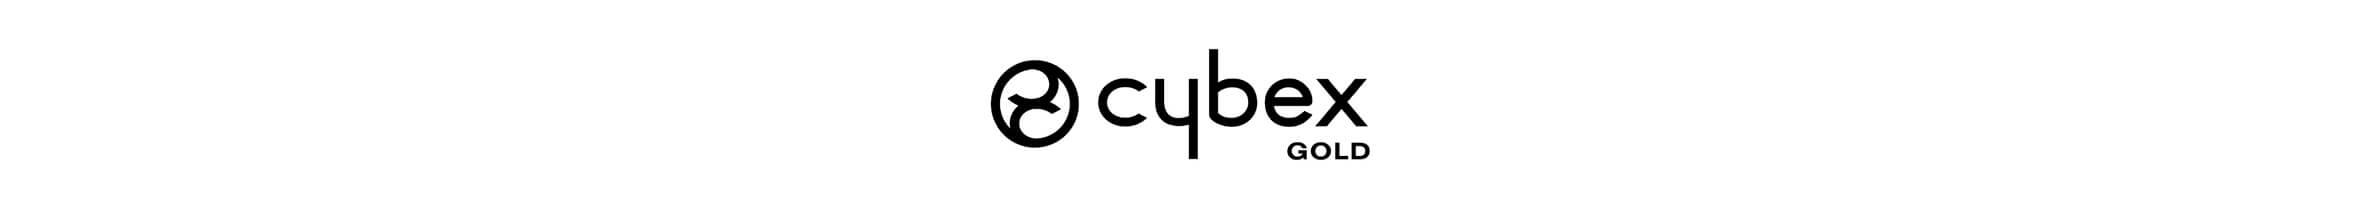 Cybex Gold